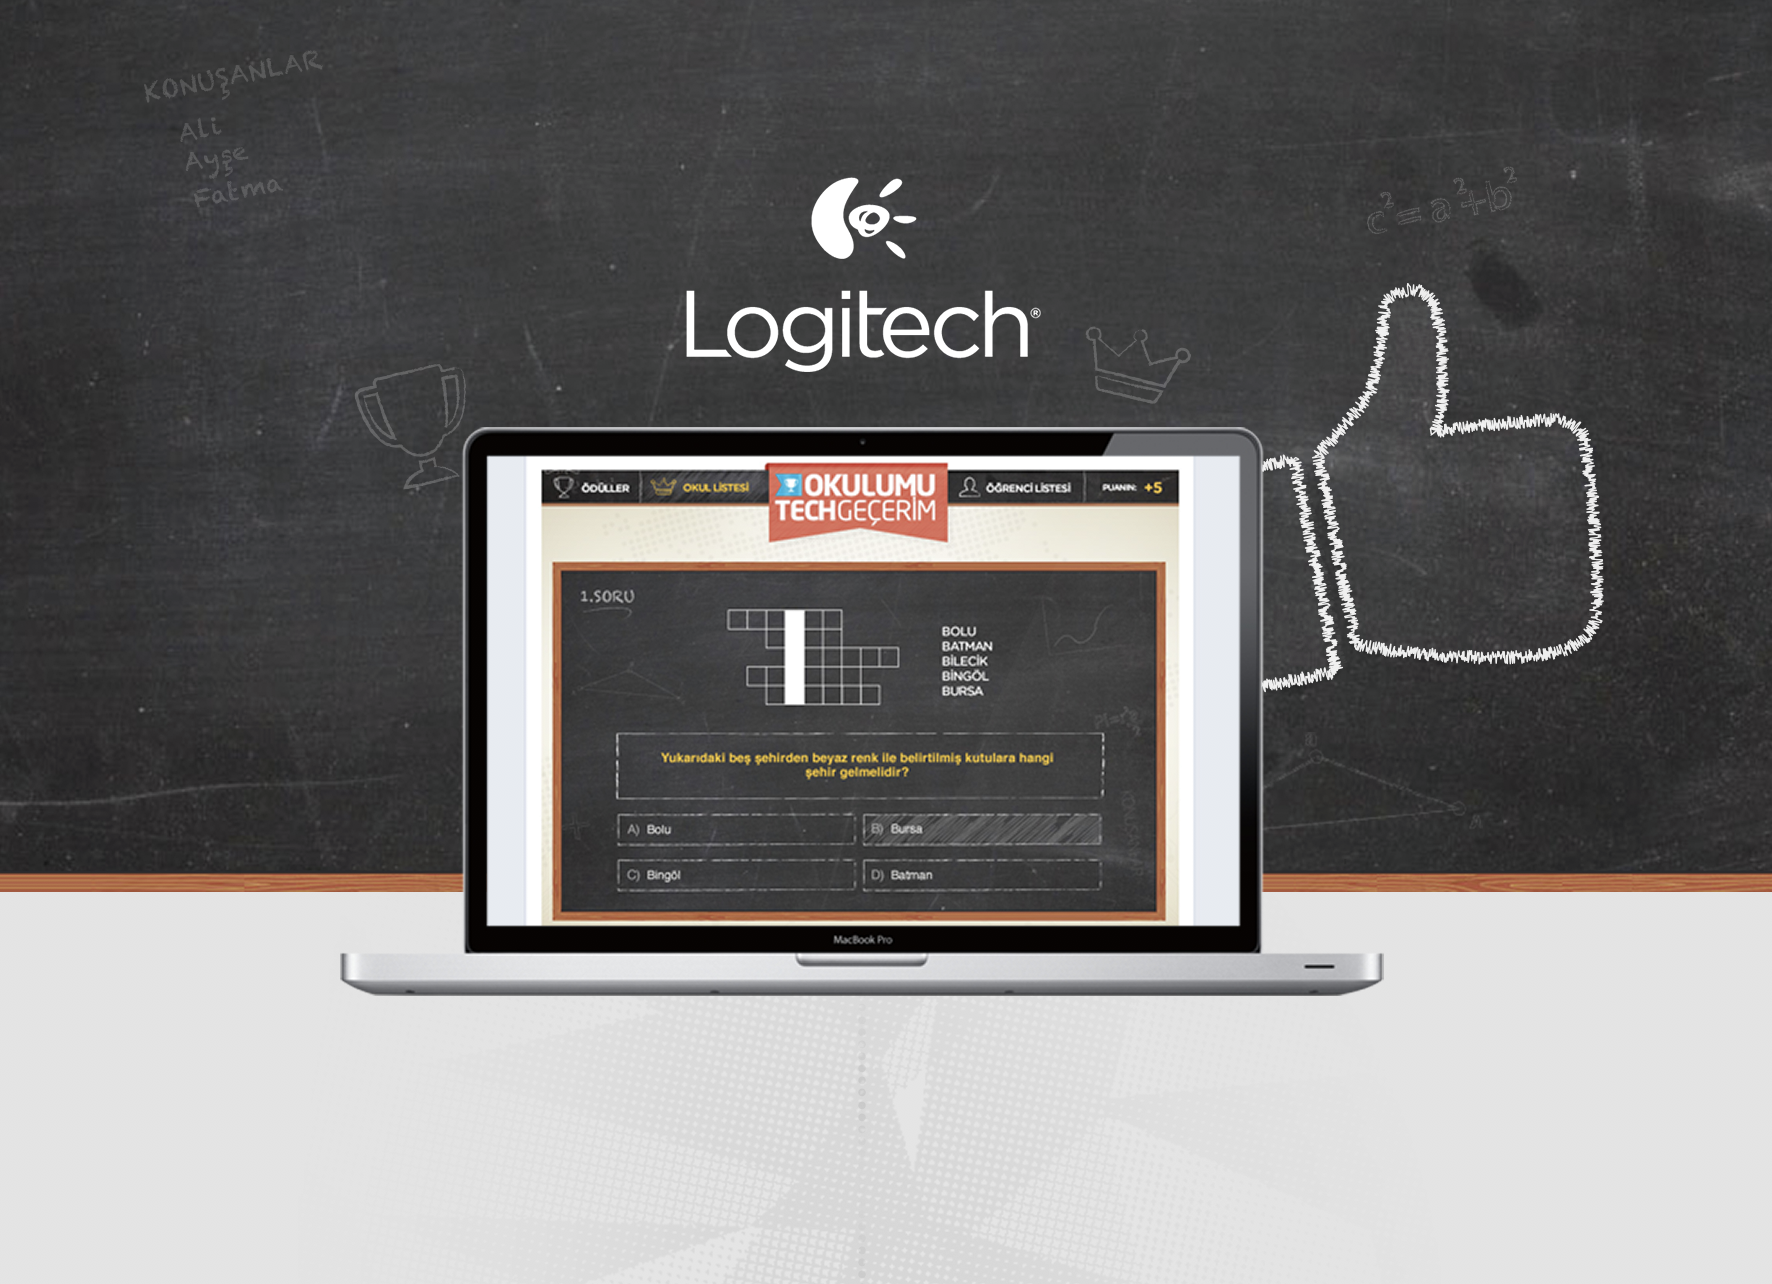 Logitech Okulumu Tech Geçerim